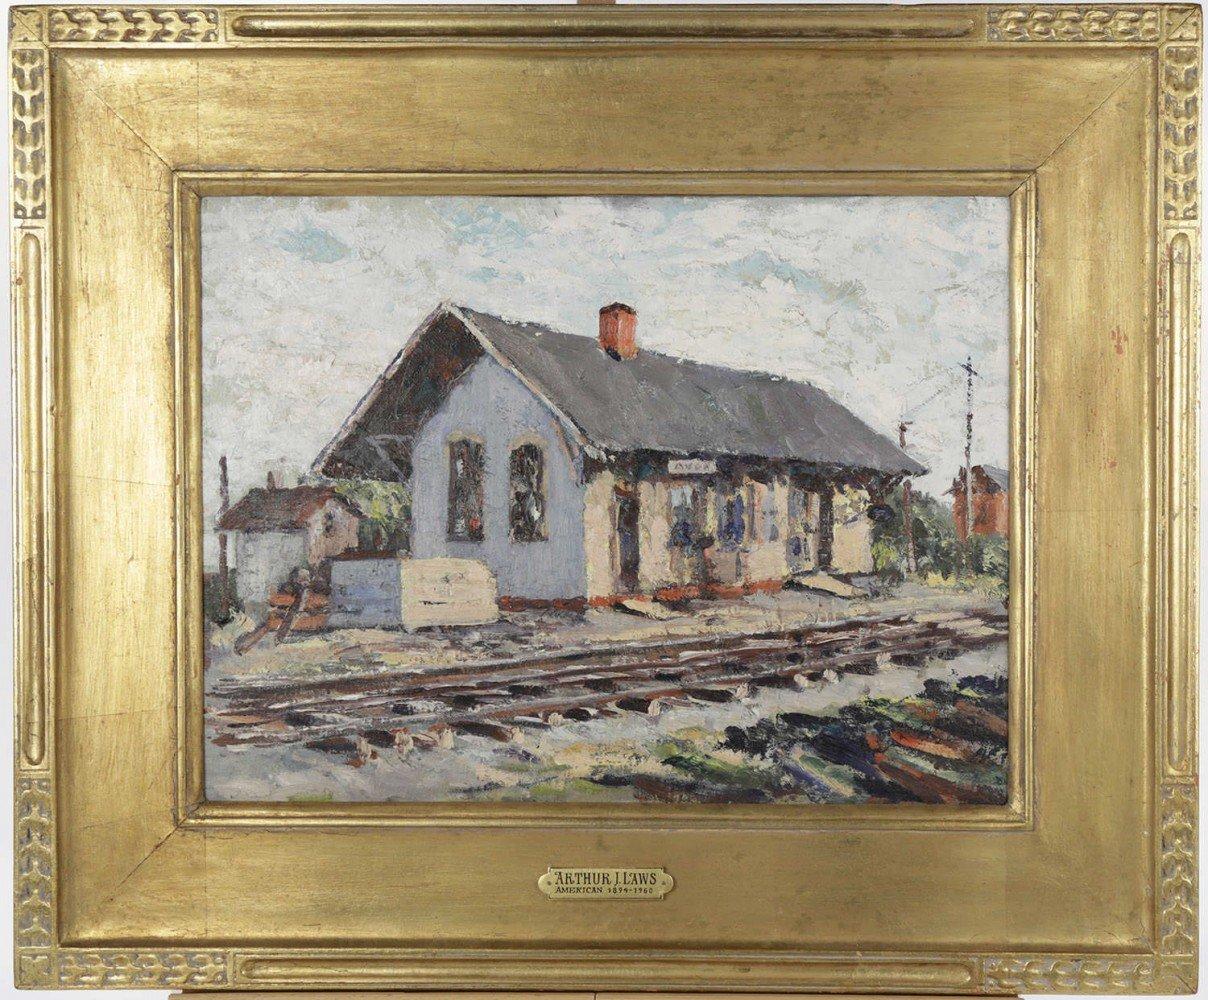 Nickel Plate Railroad Station, Avon Ohio by Arthur J. Laws